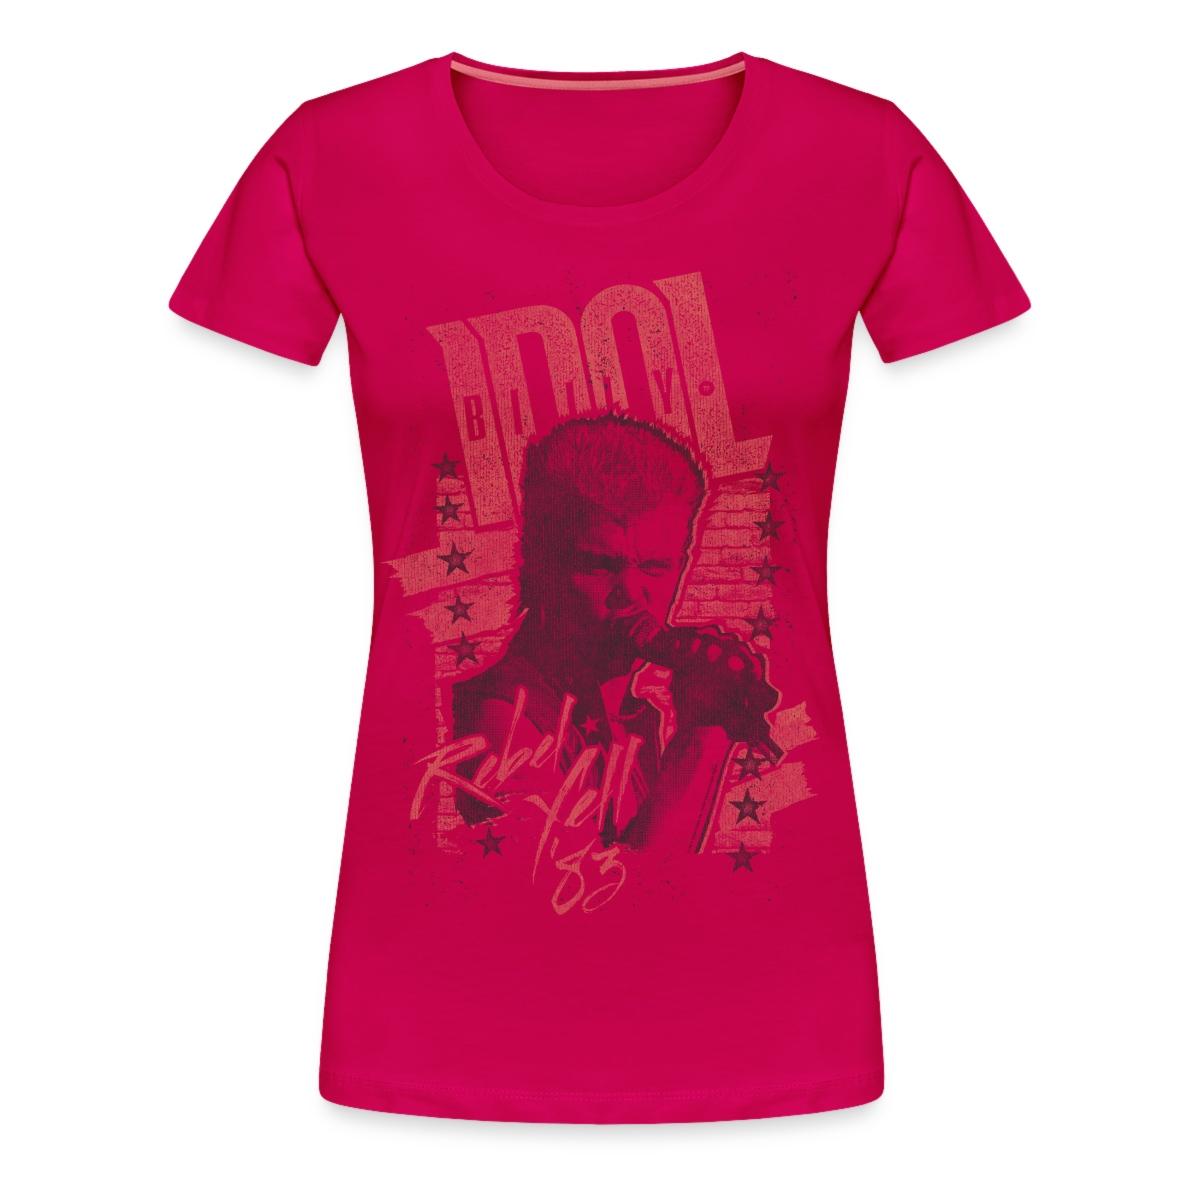 Billy Idol Rebel Yell Women' T-shirt Spreadshirt